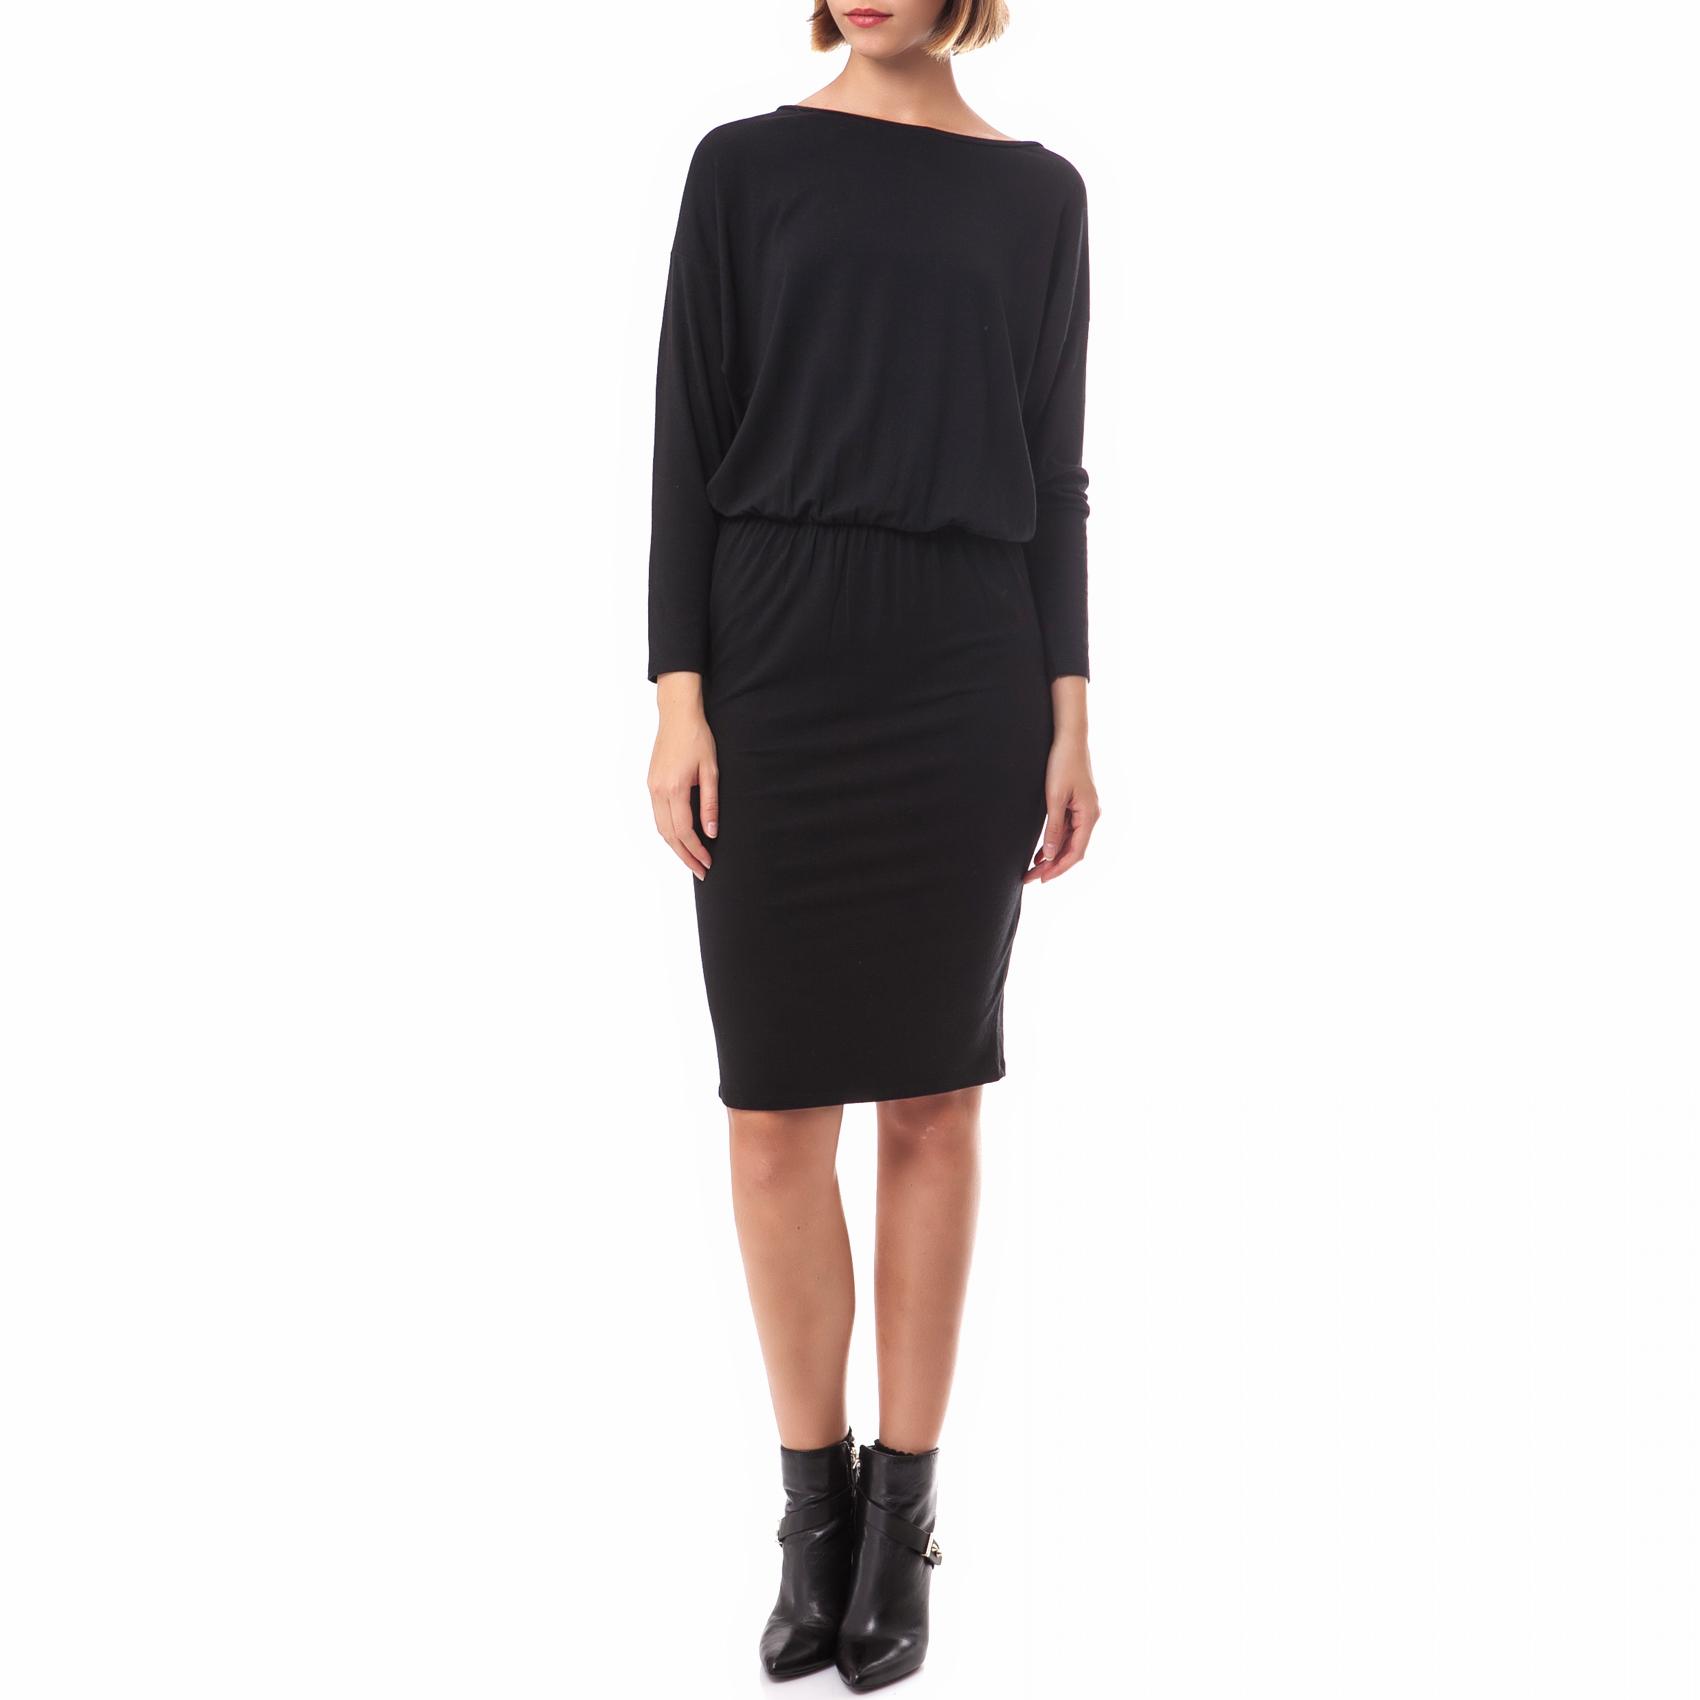 AMERICAN VINTAGE - Γυναικείο φόρεμα American Vintage μαύρο γυναικεία ρούχα φορέματα μέχρι το γόνατο